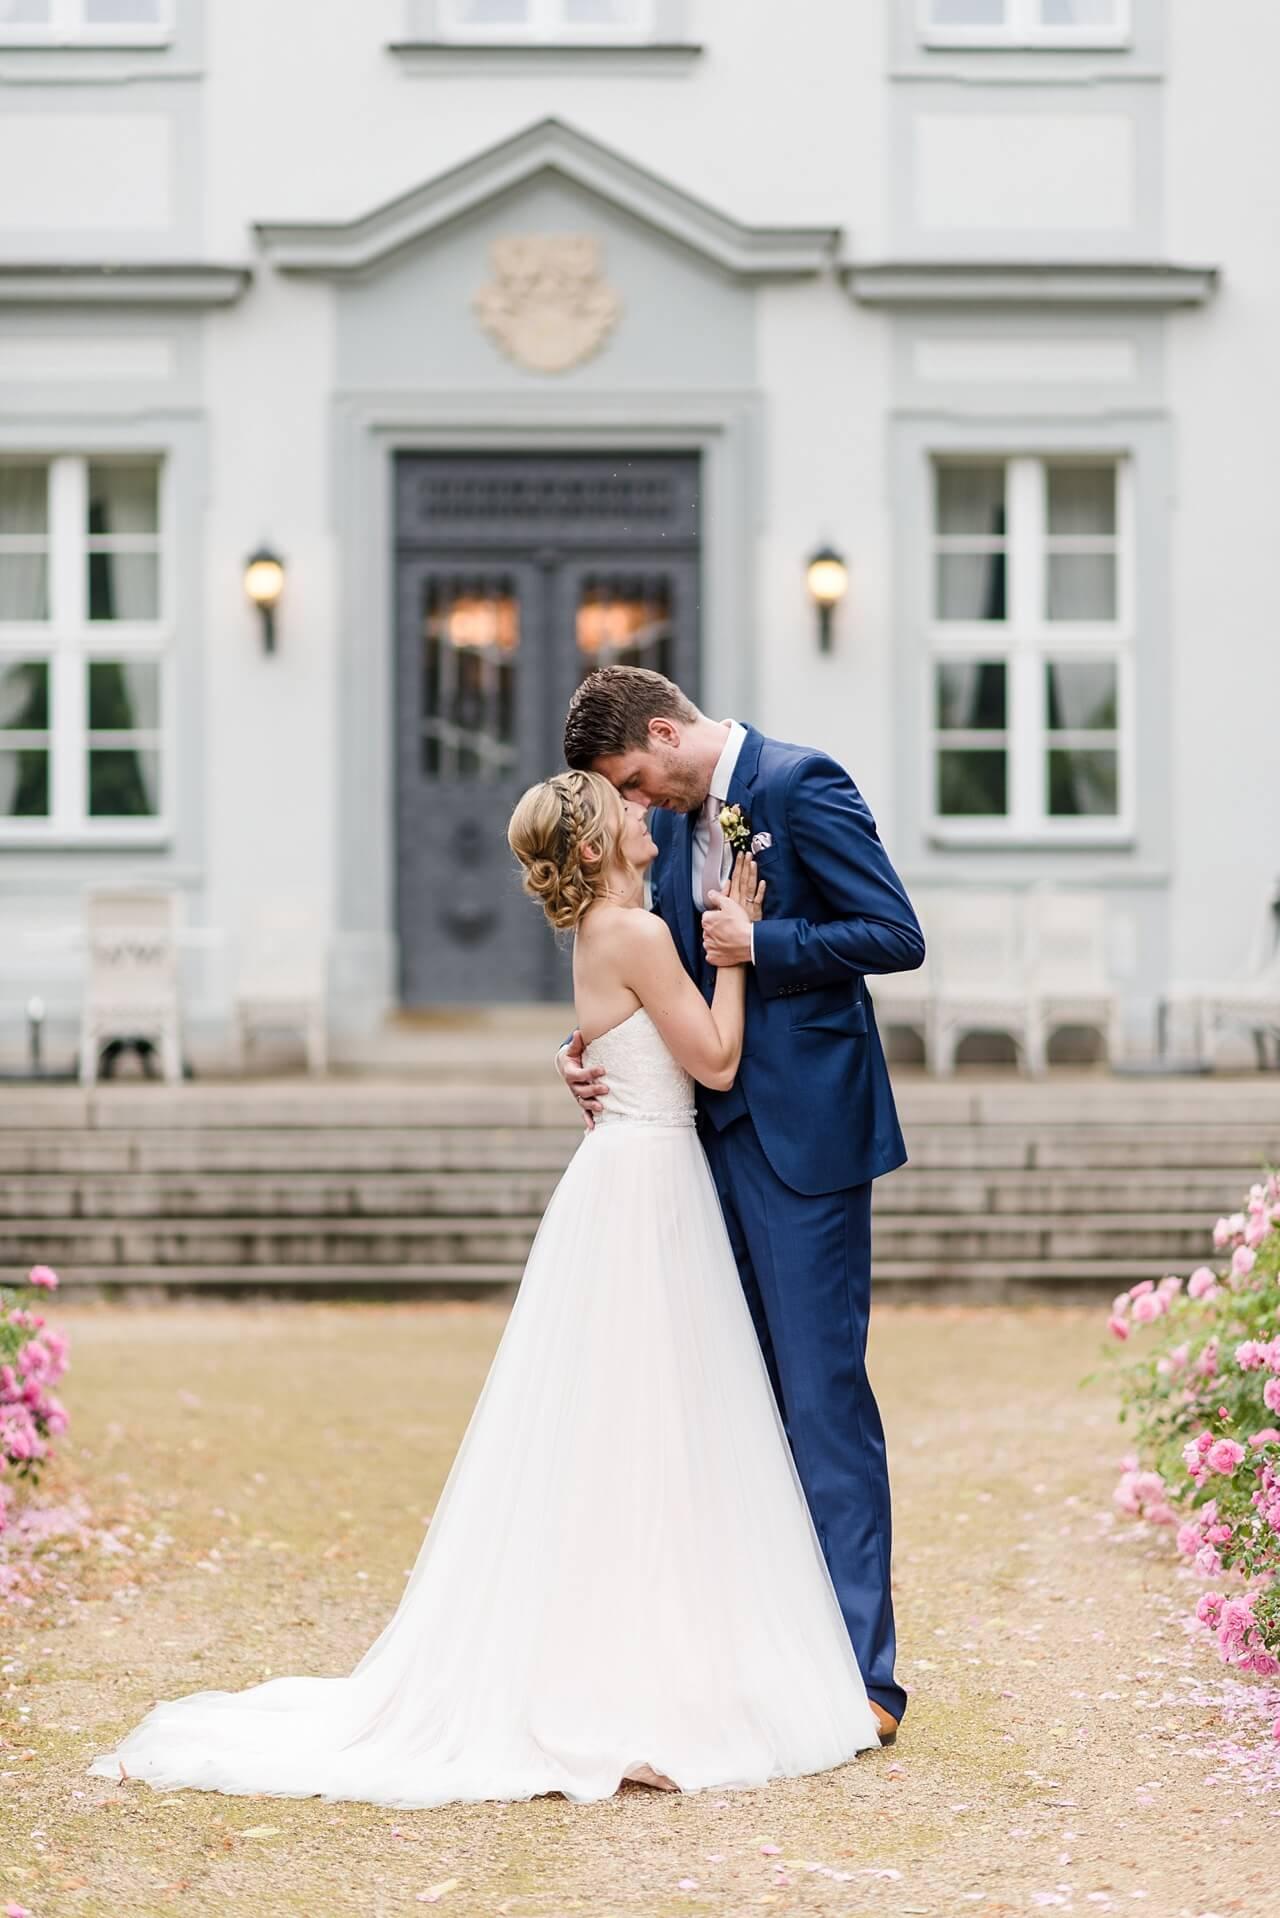 Rebecca Conte Fotografie: Heiraten in Leipzig 24